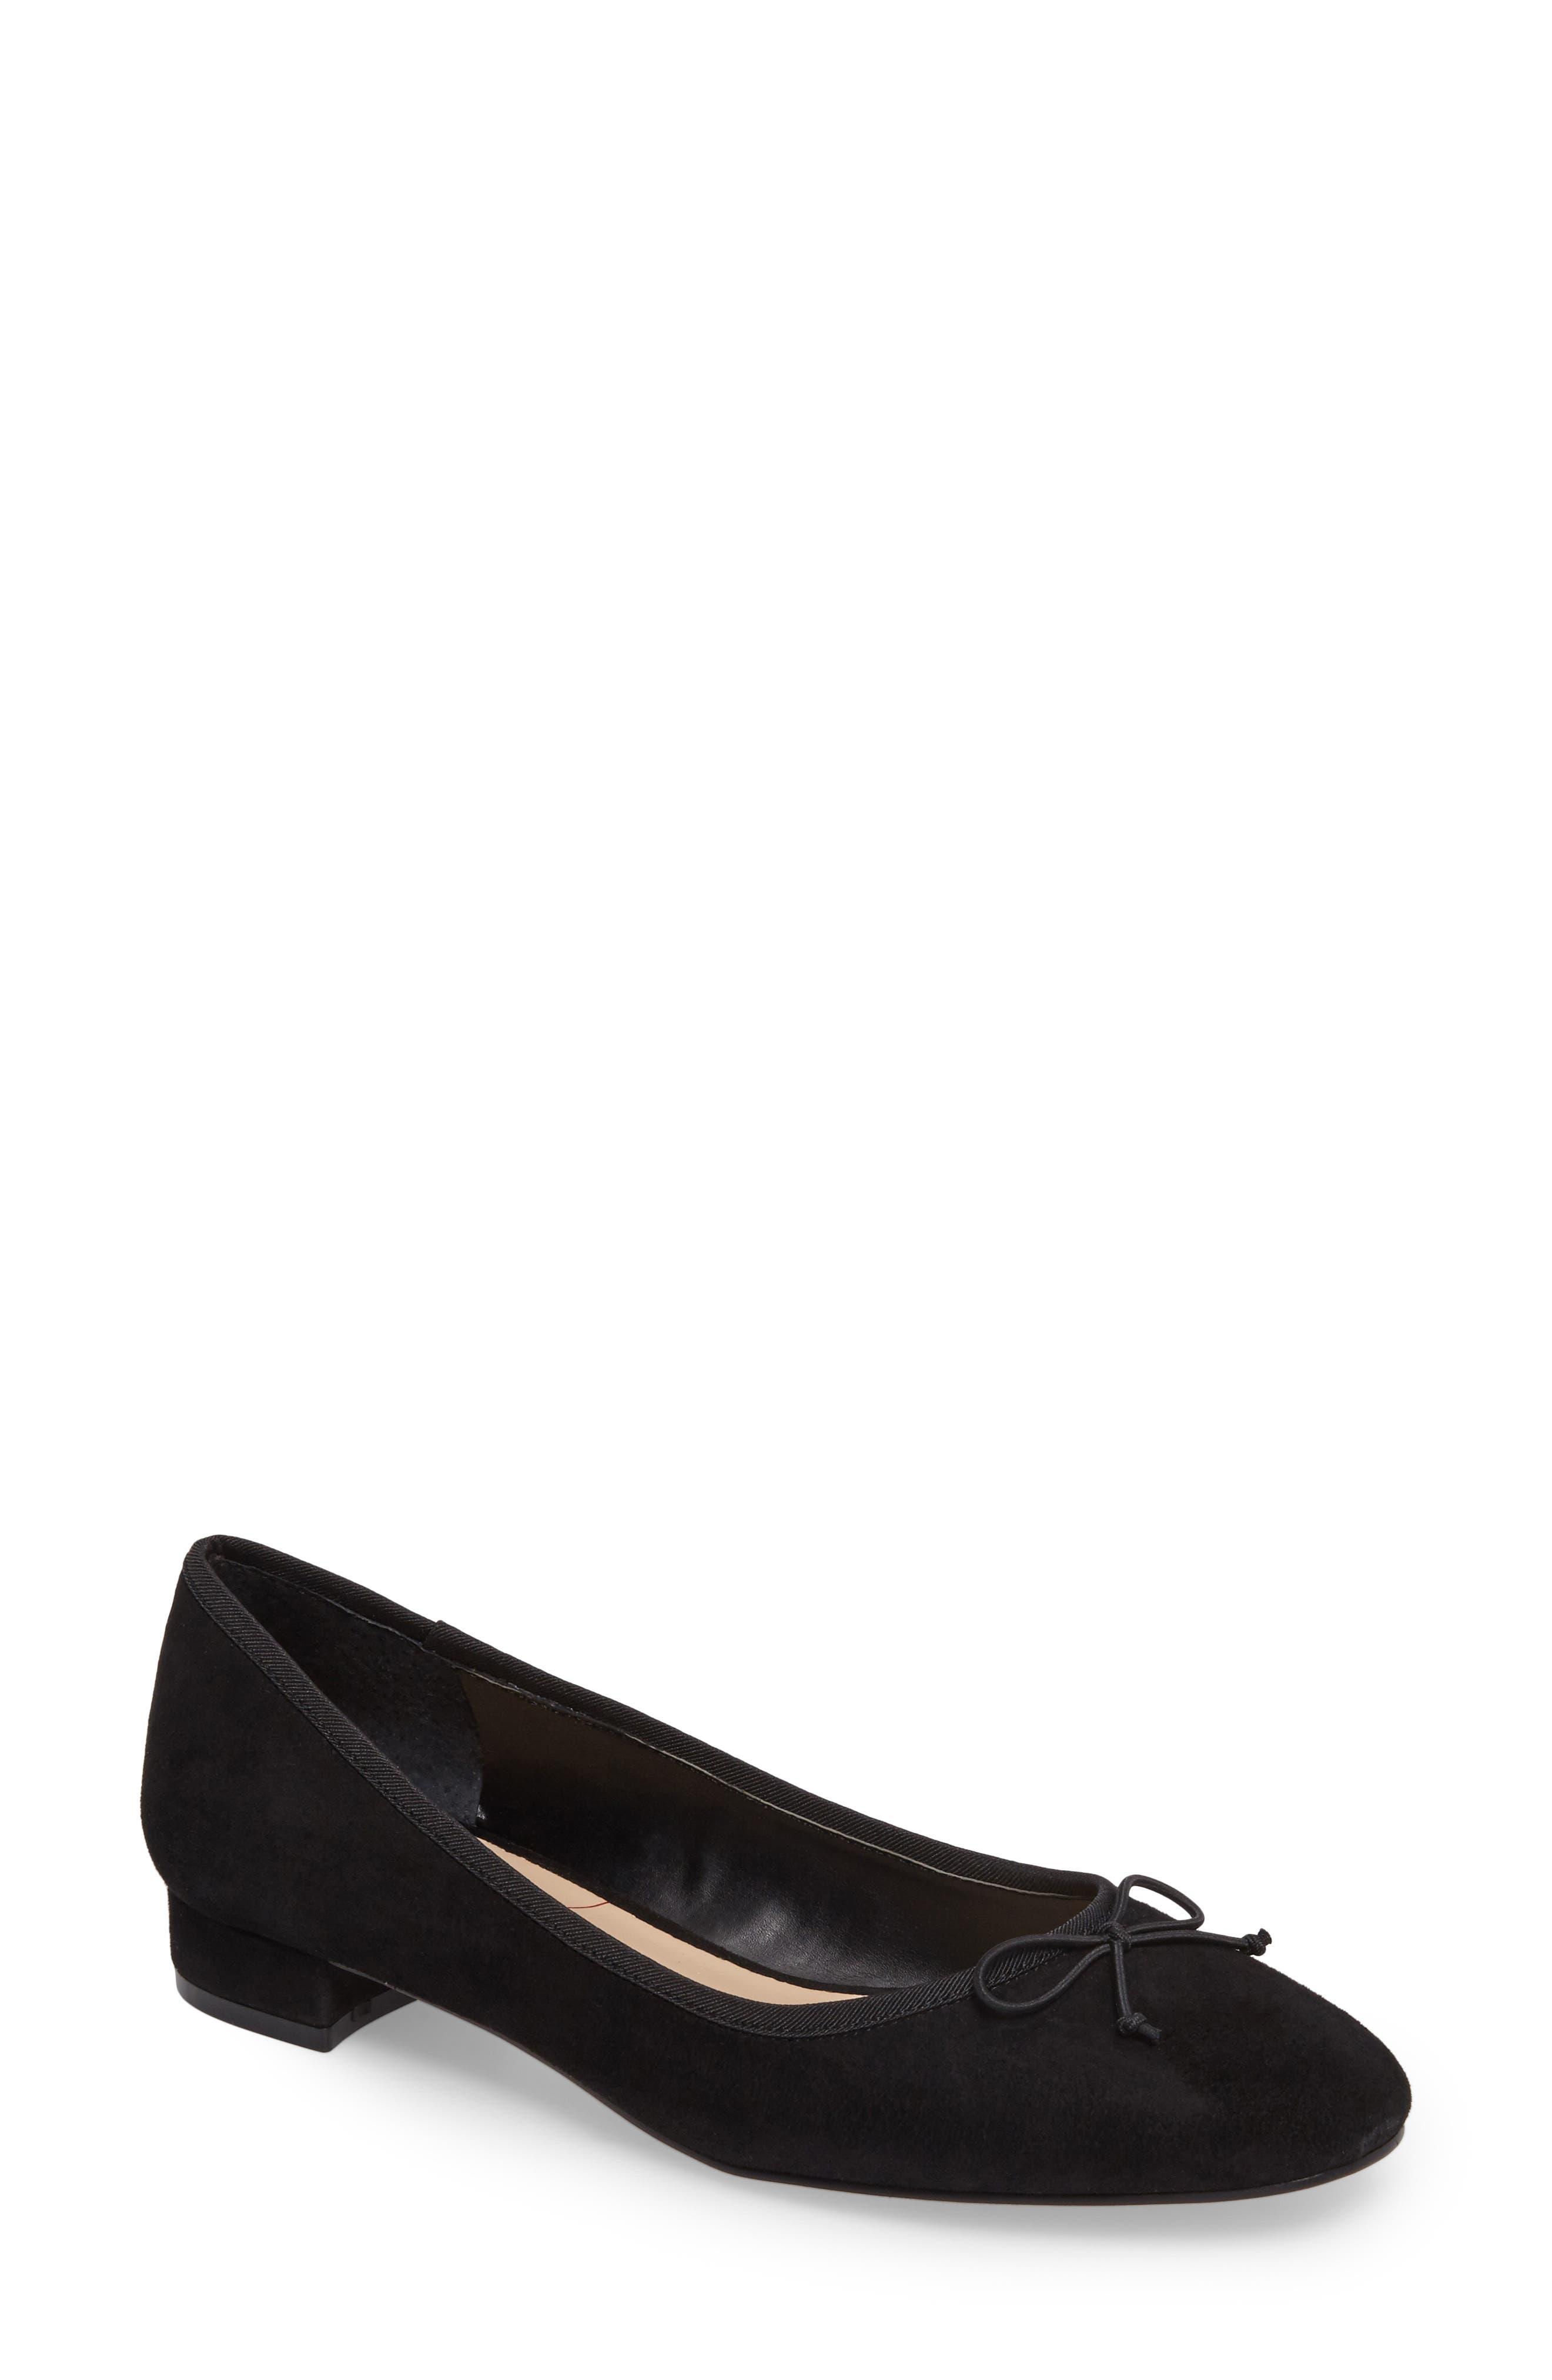 Alternate Image 1 Selected - Sole Society Anastasi Block Heel Flat (Women)